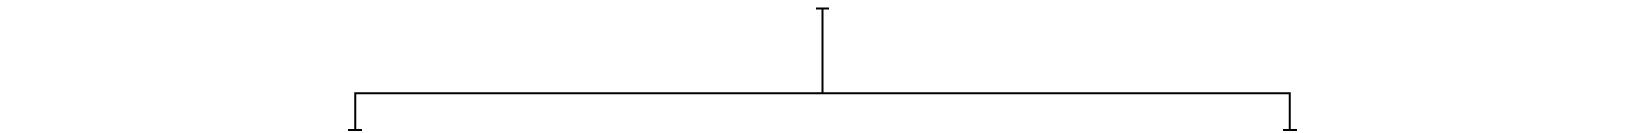 BS001_Squarespace_2.jpg